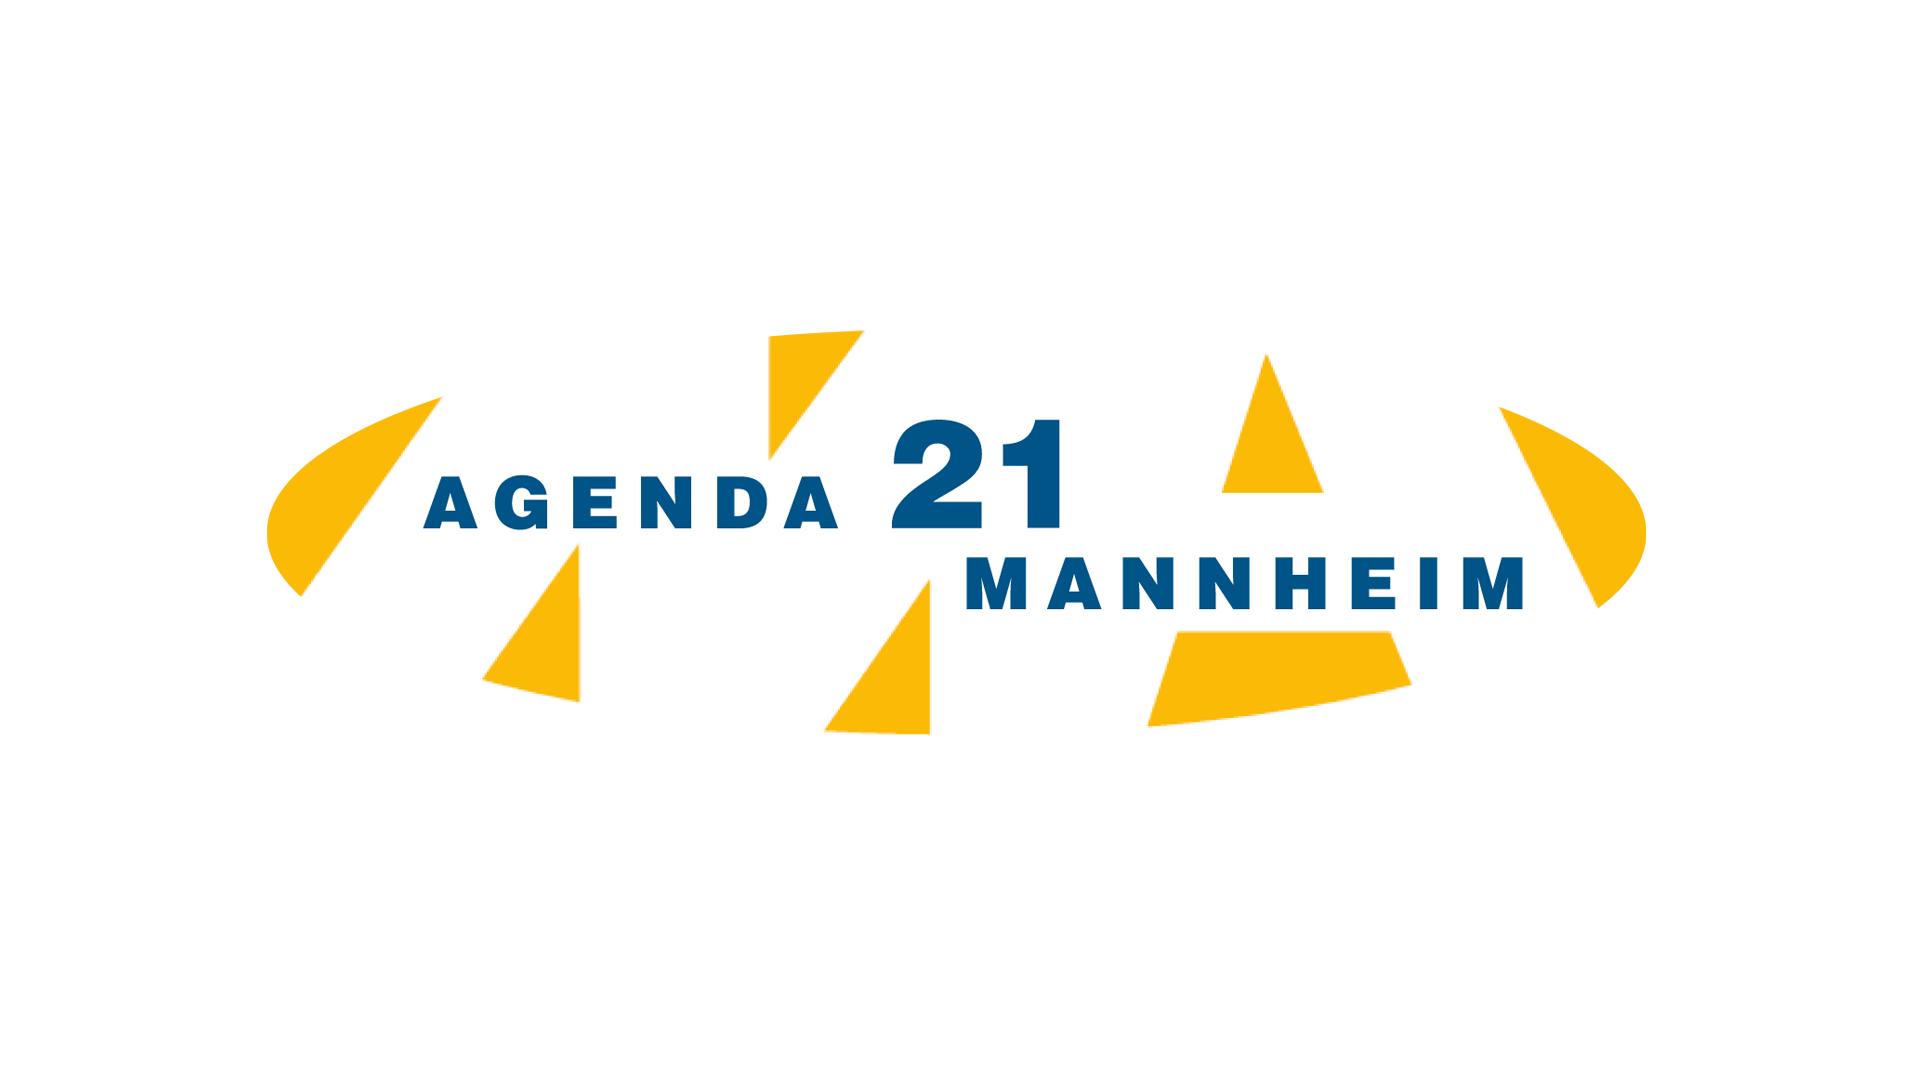 Agenda 21 Mannheim Logo, Flyer, Plakate, Infostand